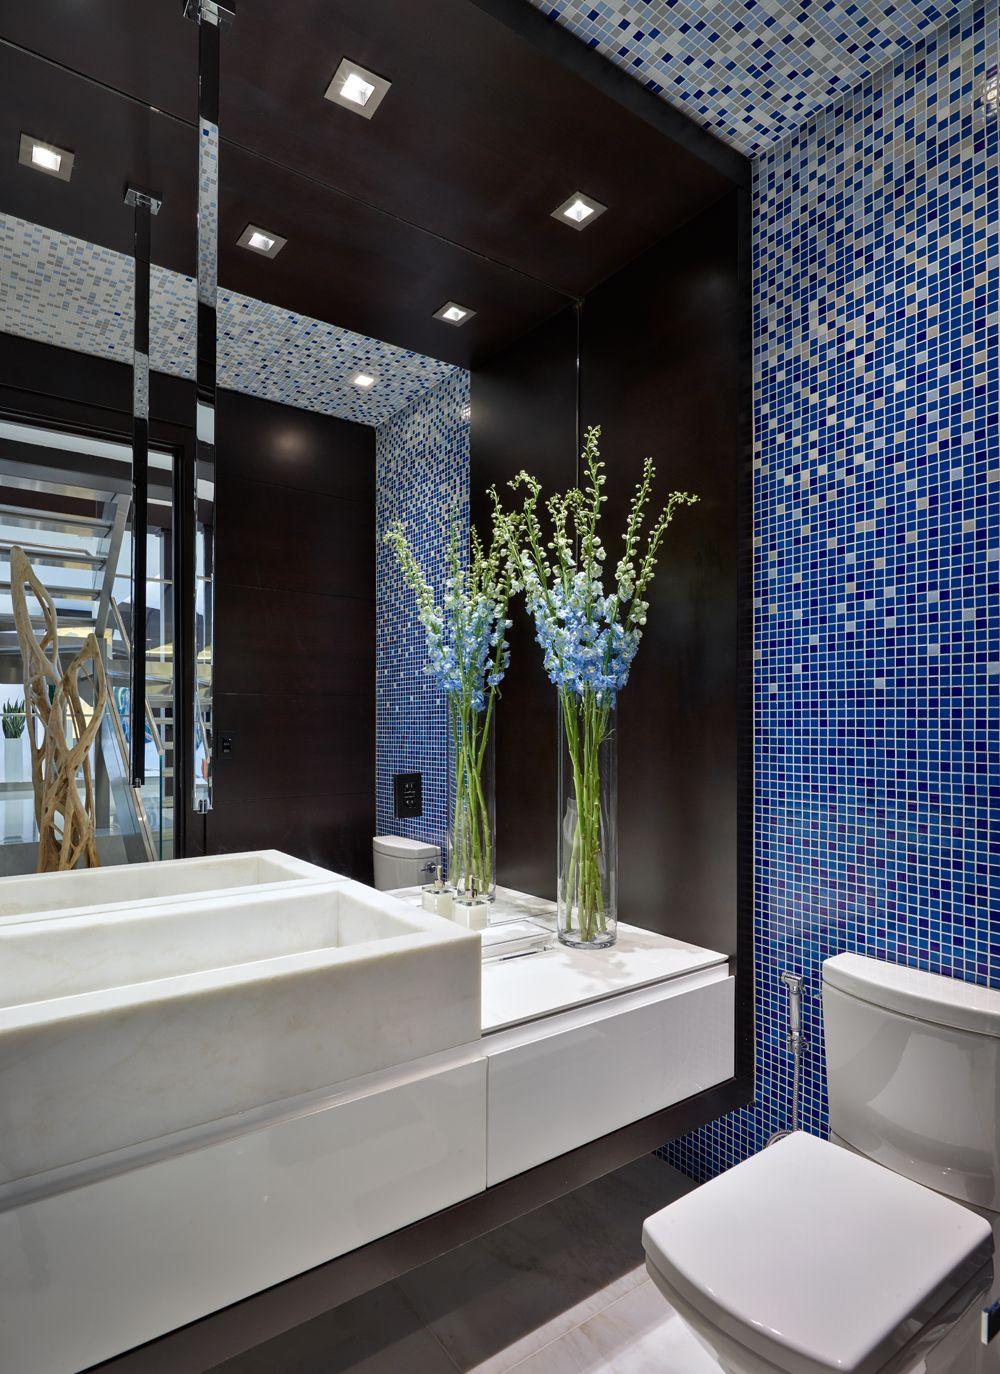 33 Bathroom Tile Design Ideas - Unique Tiled Bathrooms on Bathroom Tile Designs  id=67250